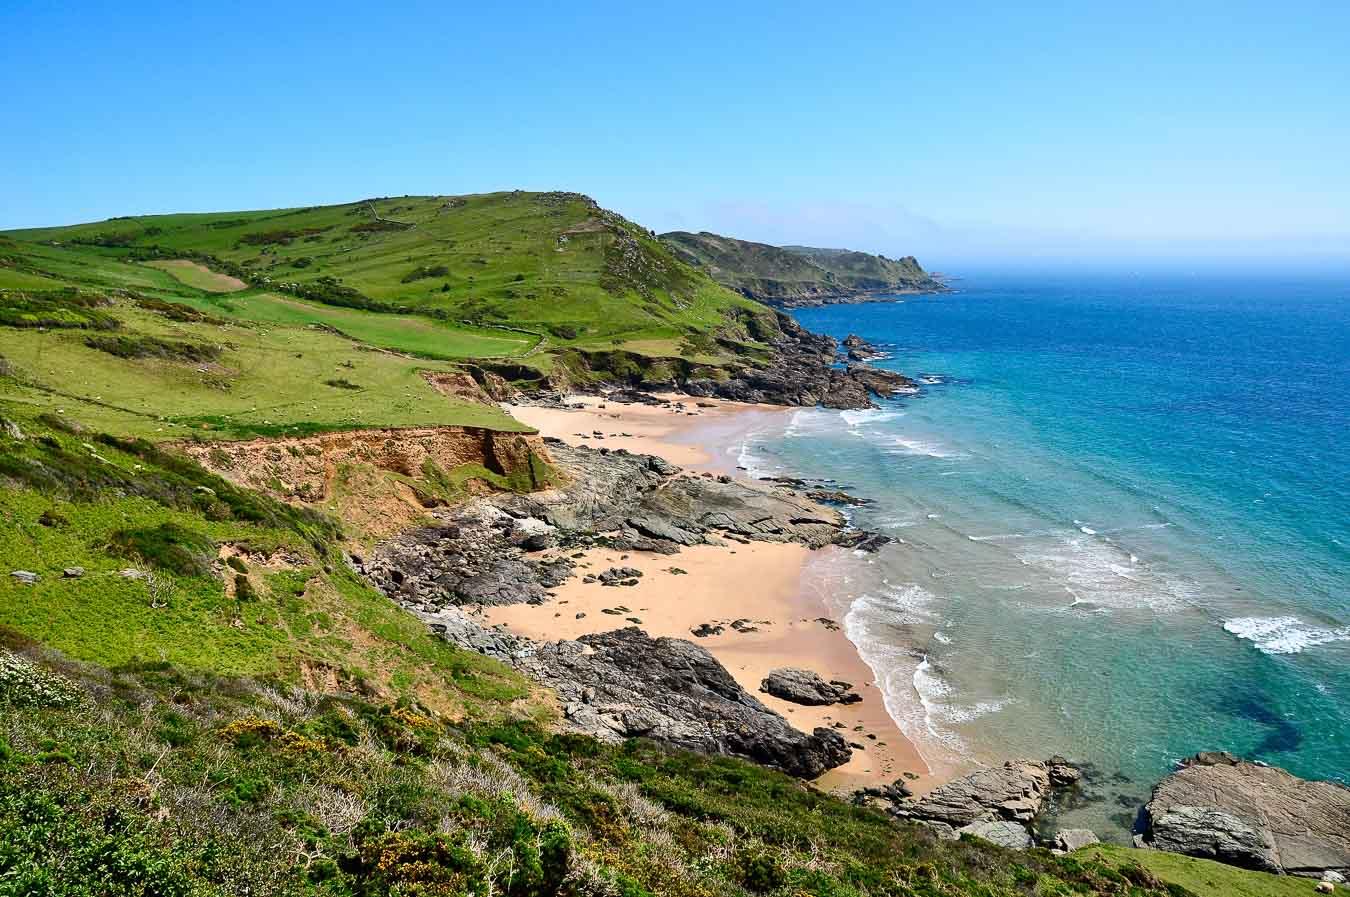 Gara Rock Beach, also known as Seacombe Sands, Devon.